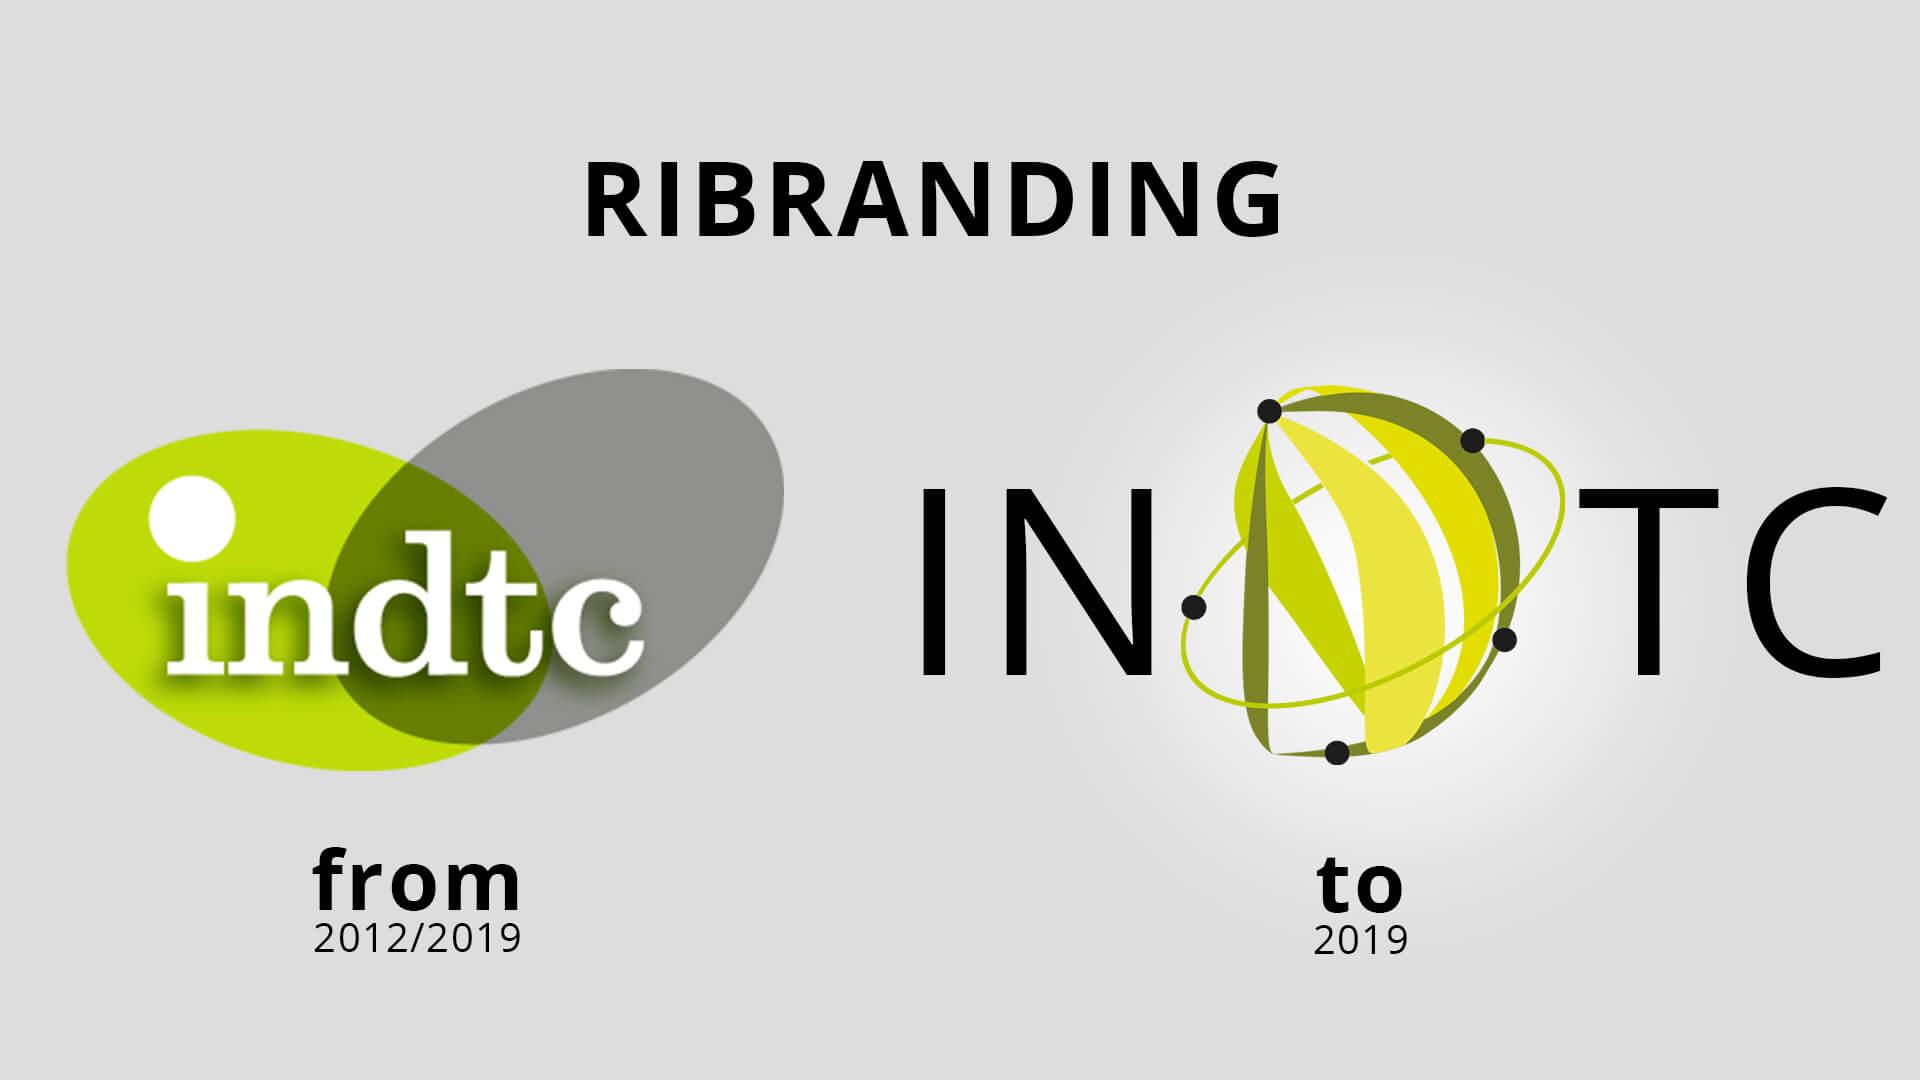 ribranding indtc